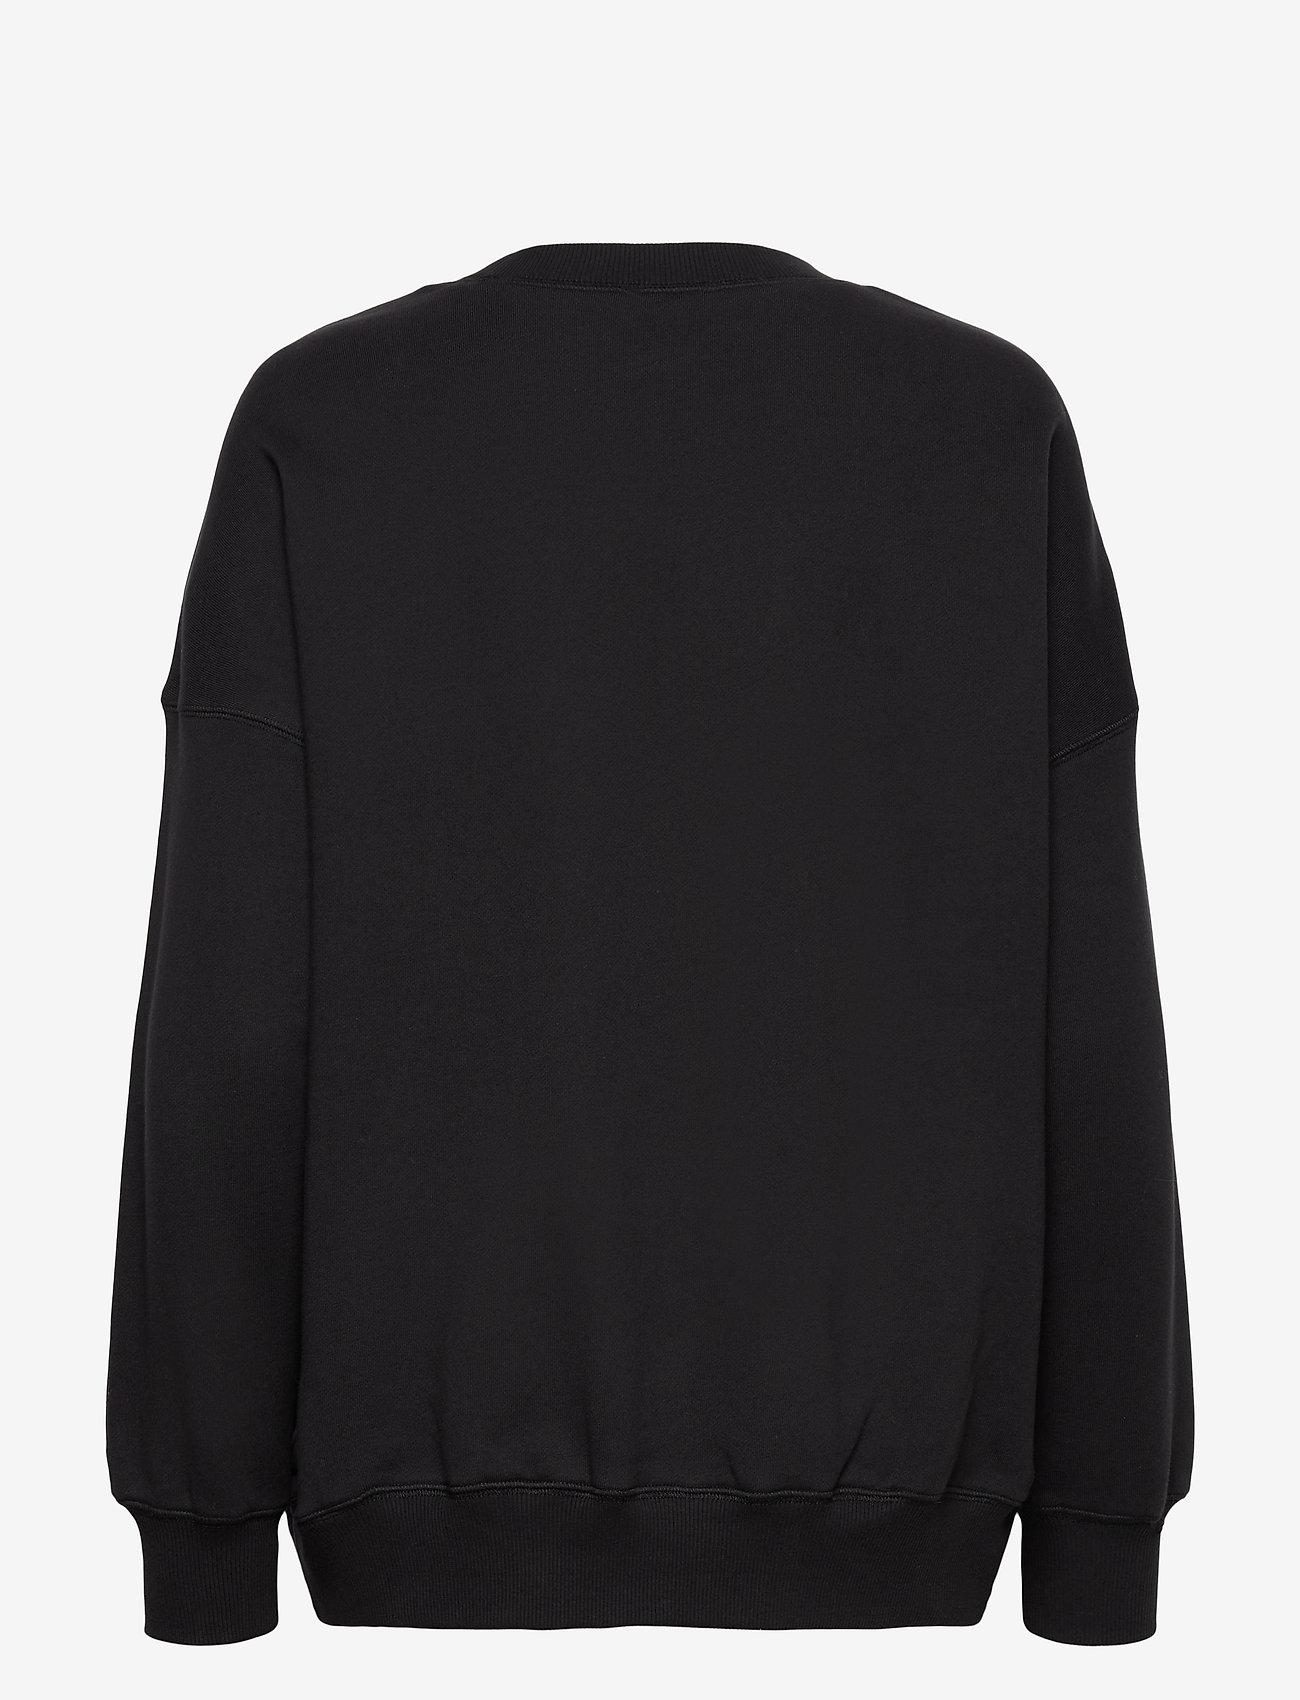 Coster Copenhagen - CC Heart oversize sweatshirt - Orga - sweatshirts & hættetrøjer - black - 1